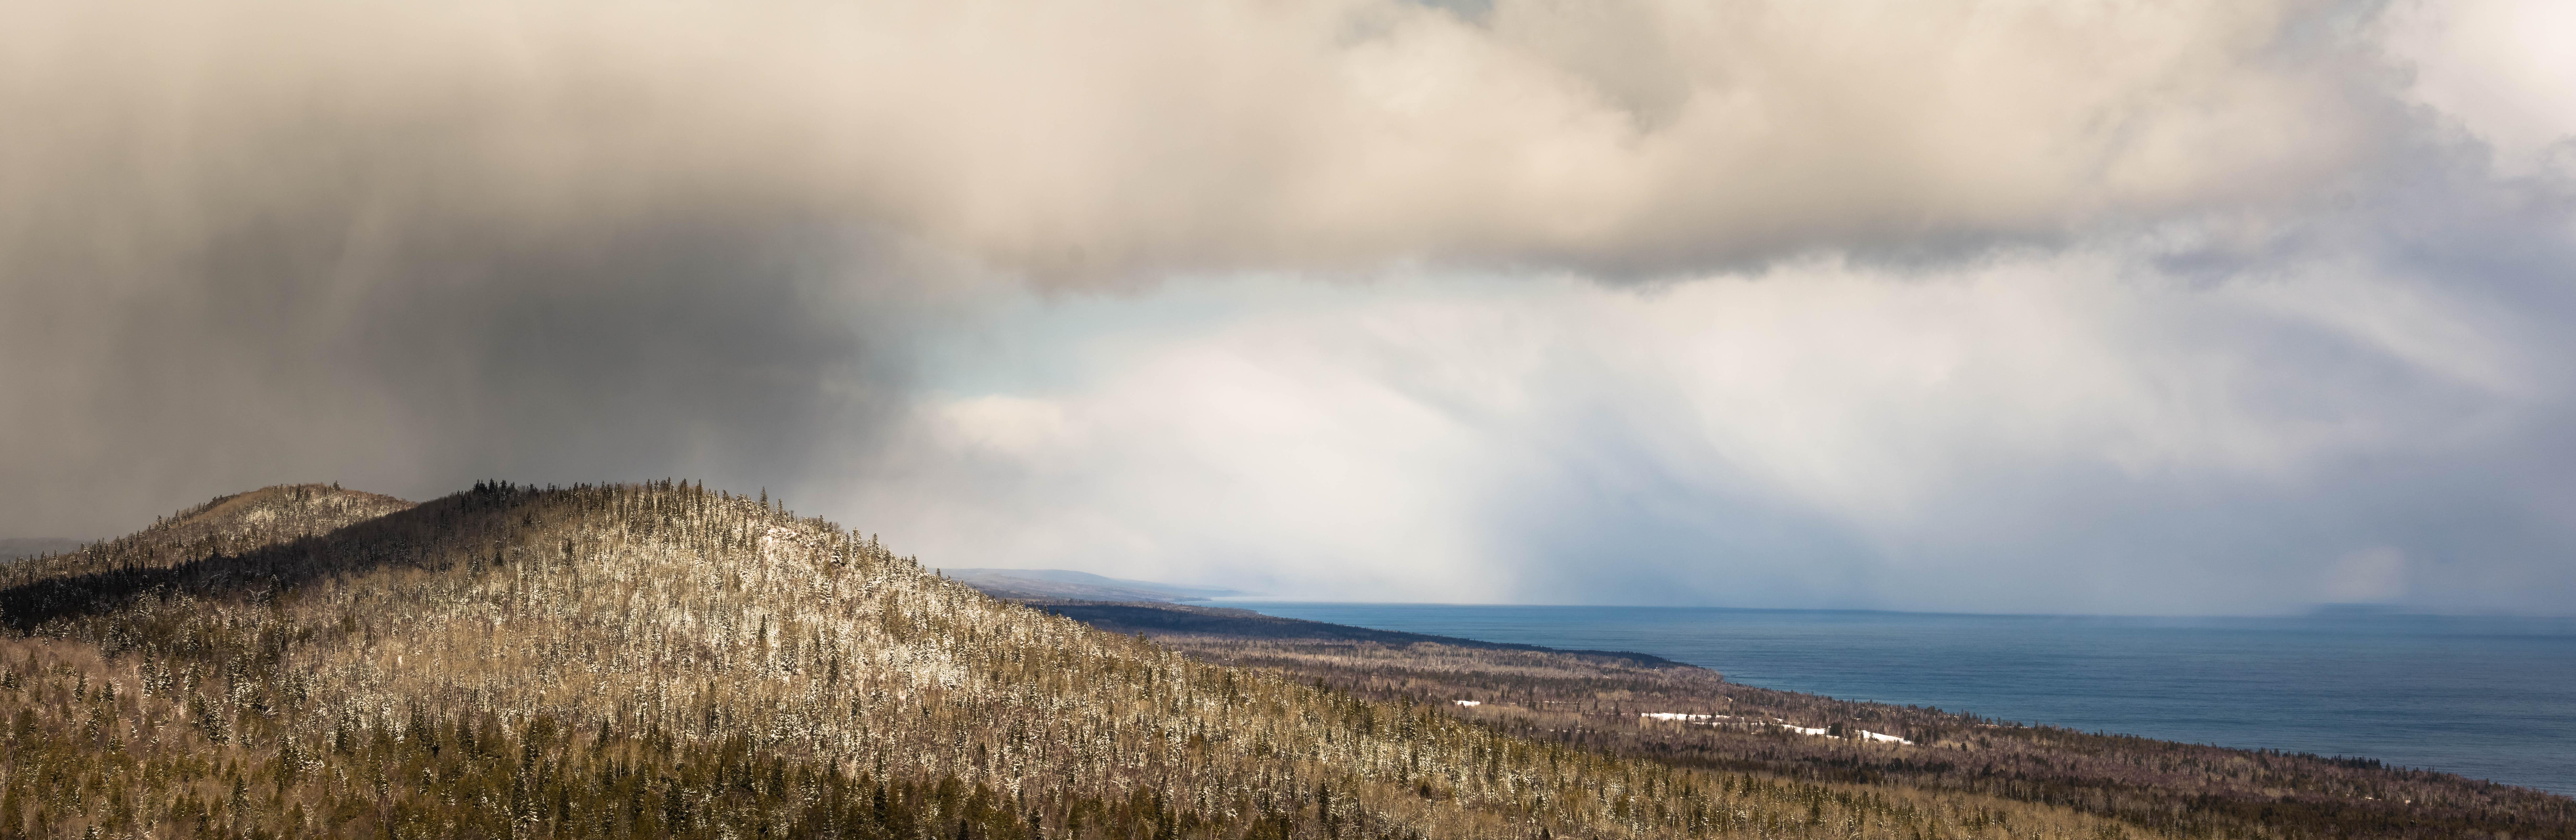 Oberg Trail Views - North Shore MN